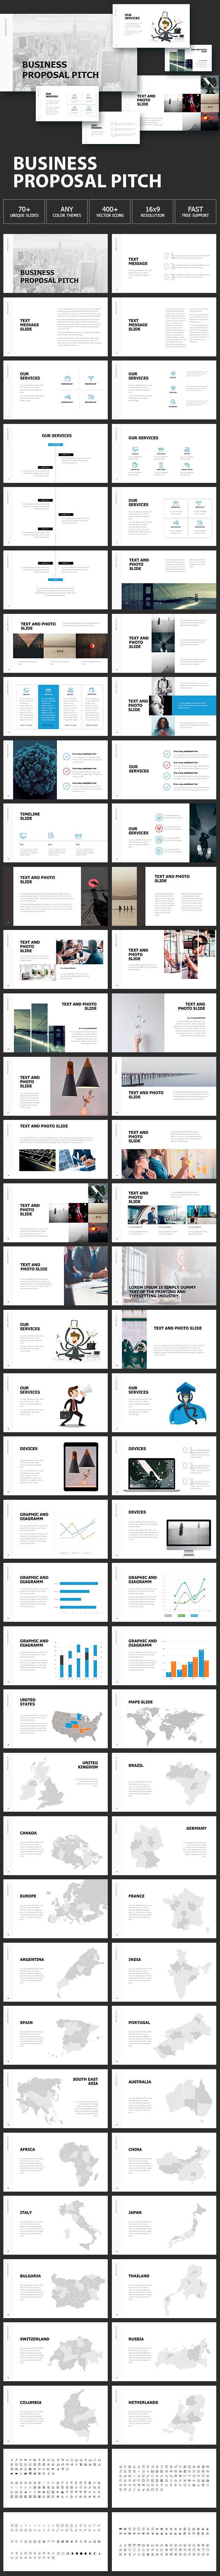 Business Proposal Pitch | Business proposal, Business powerpoint ...